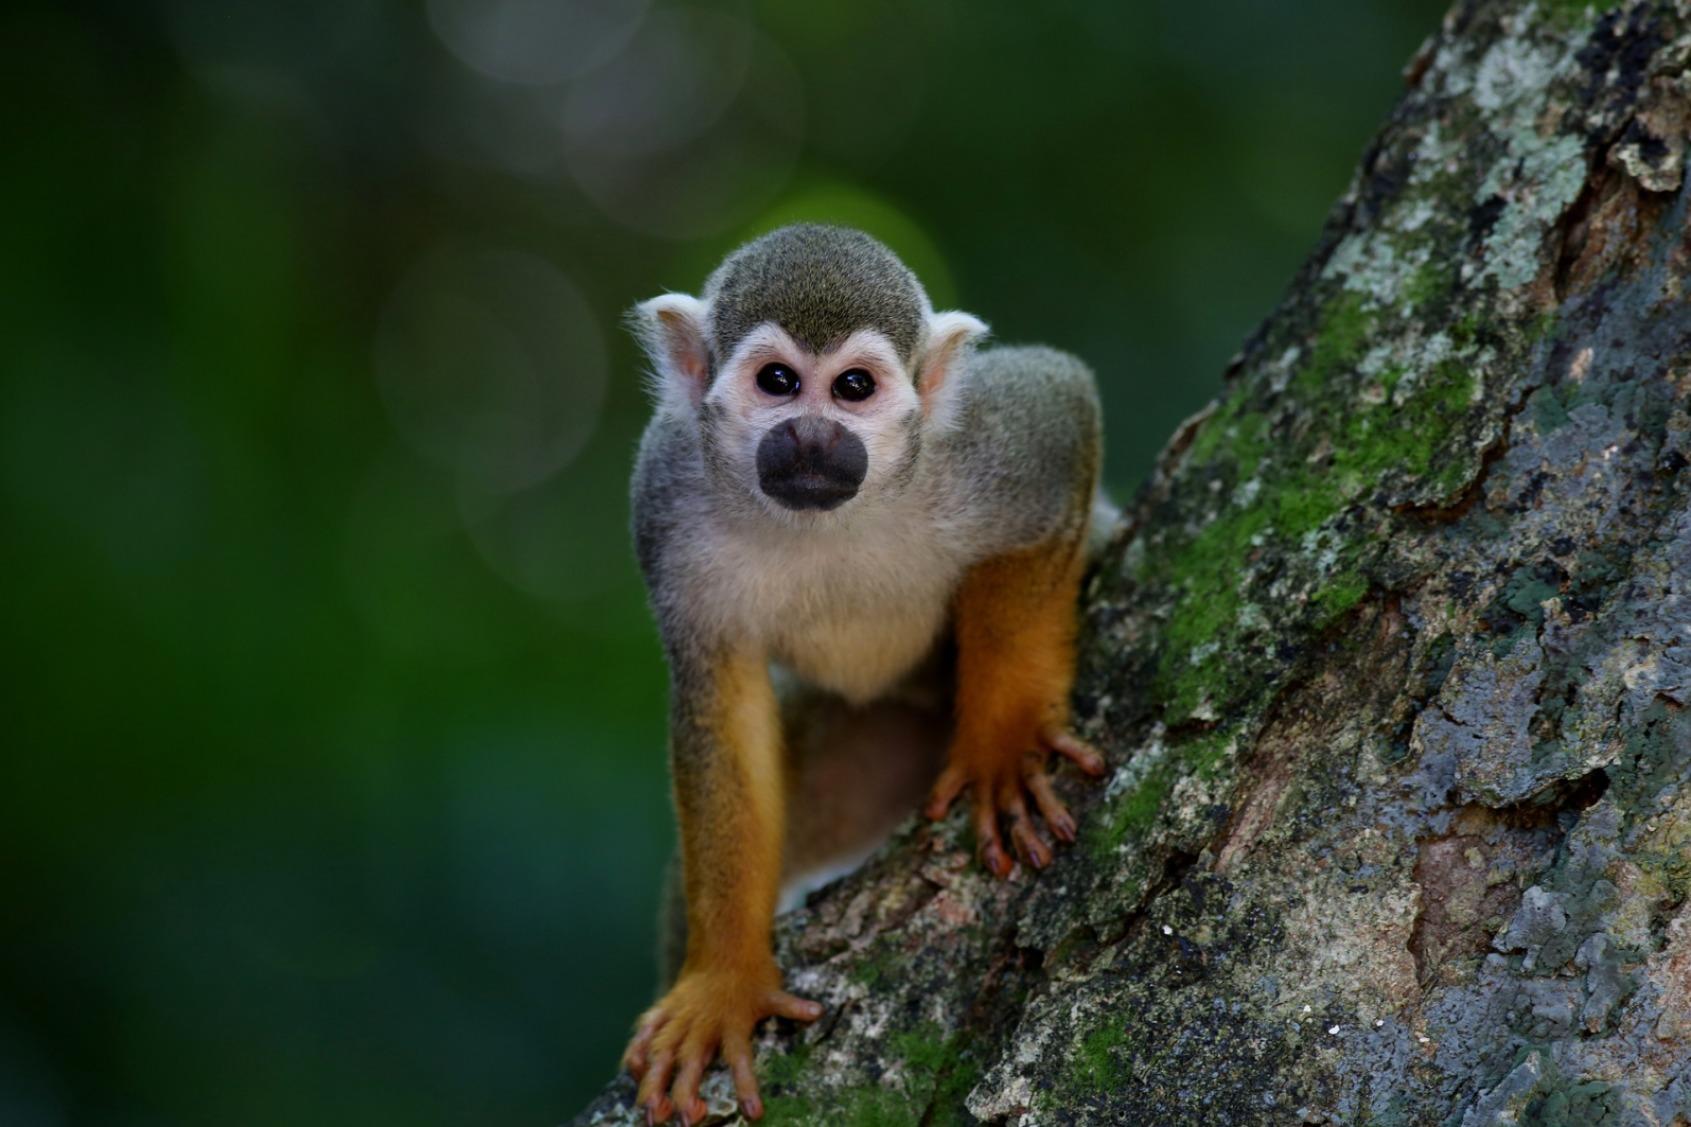 Little Monkey - Original image